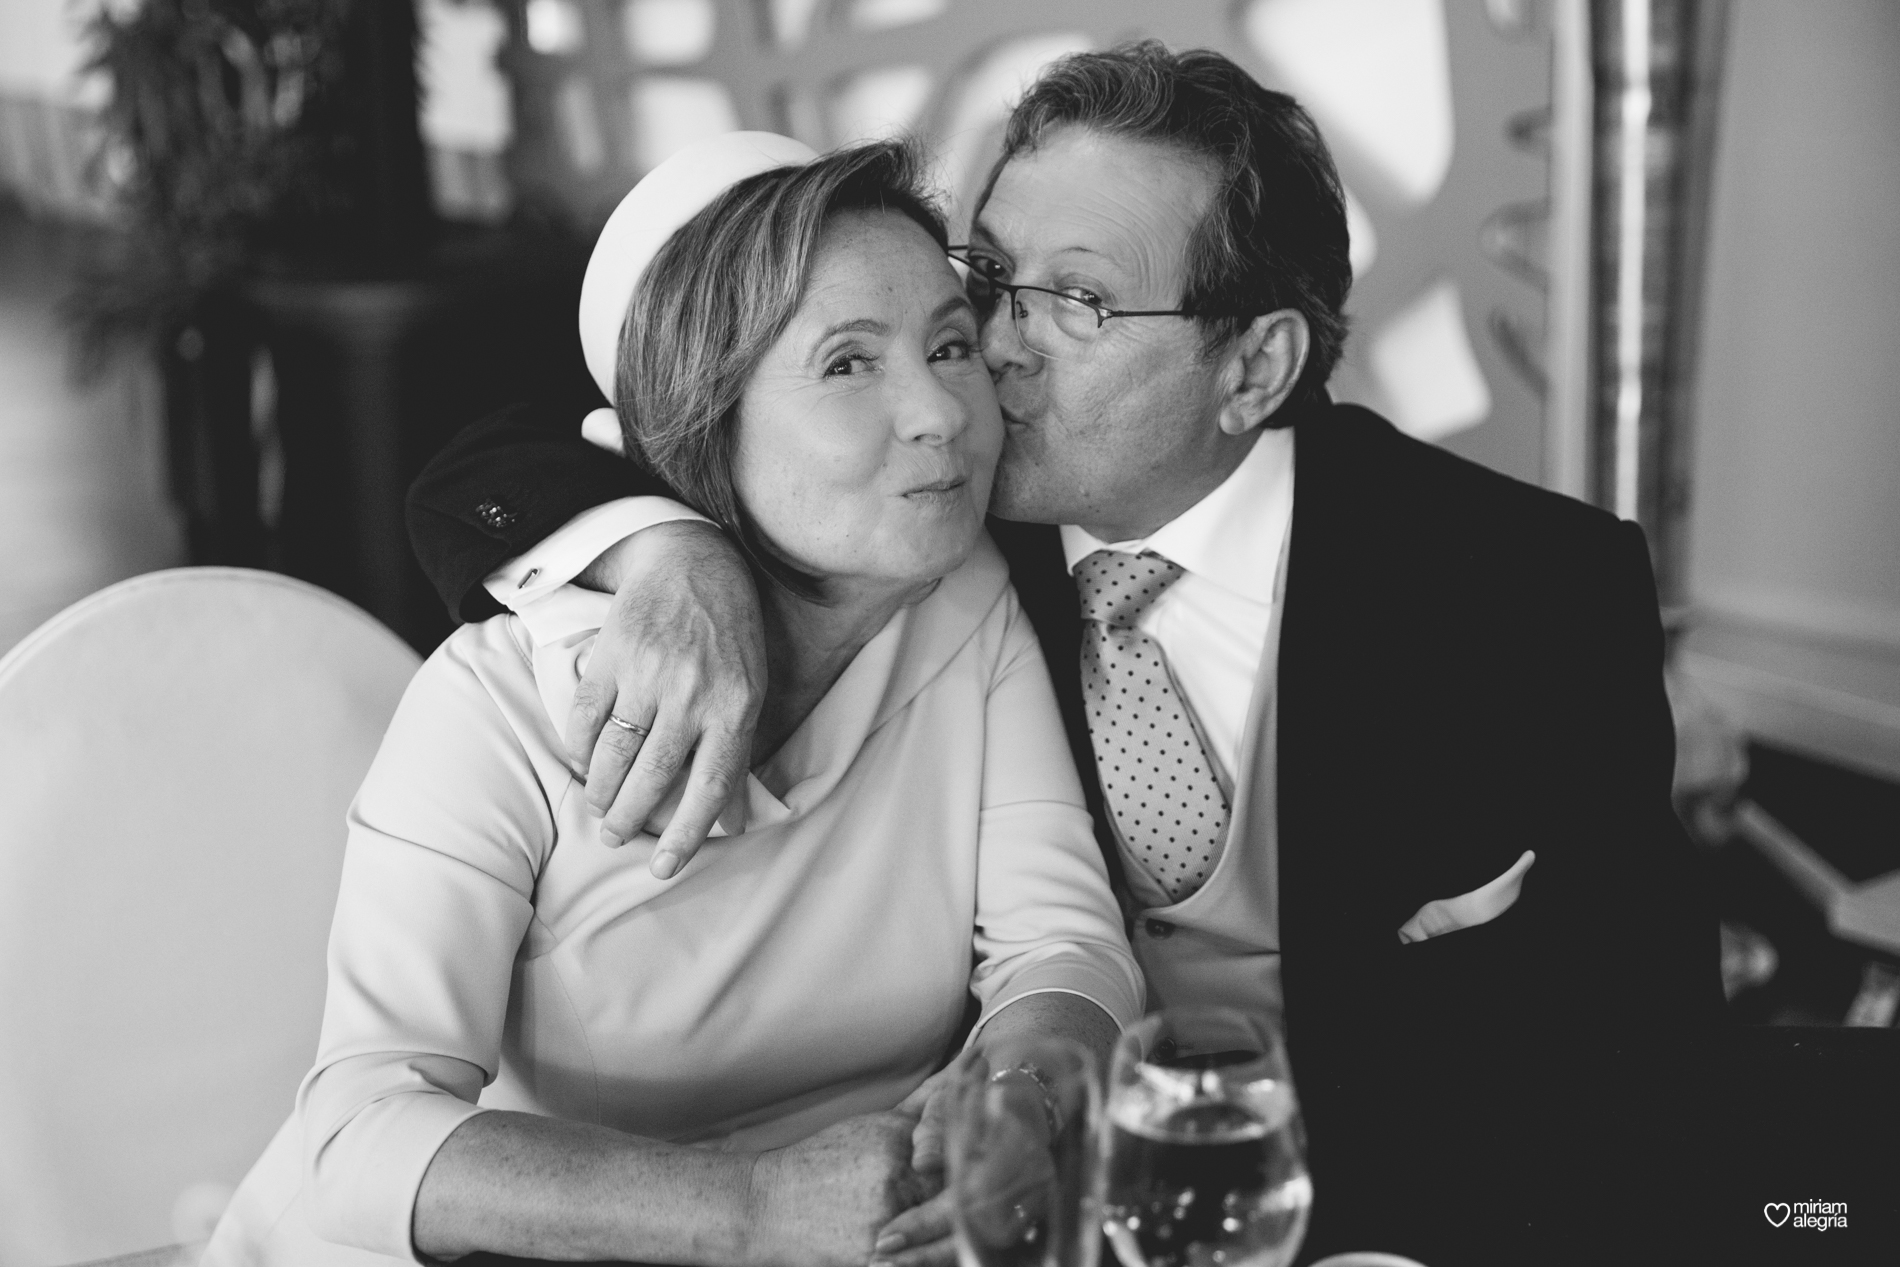 boda-en-la-catedral-de-murcia-miriam-alegria-fotografos-boda-murcia-66